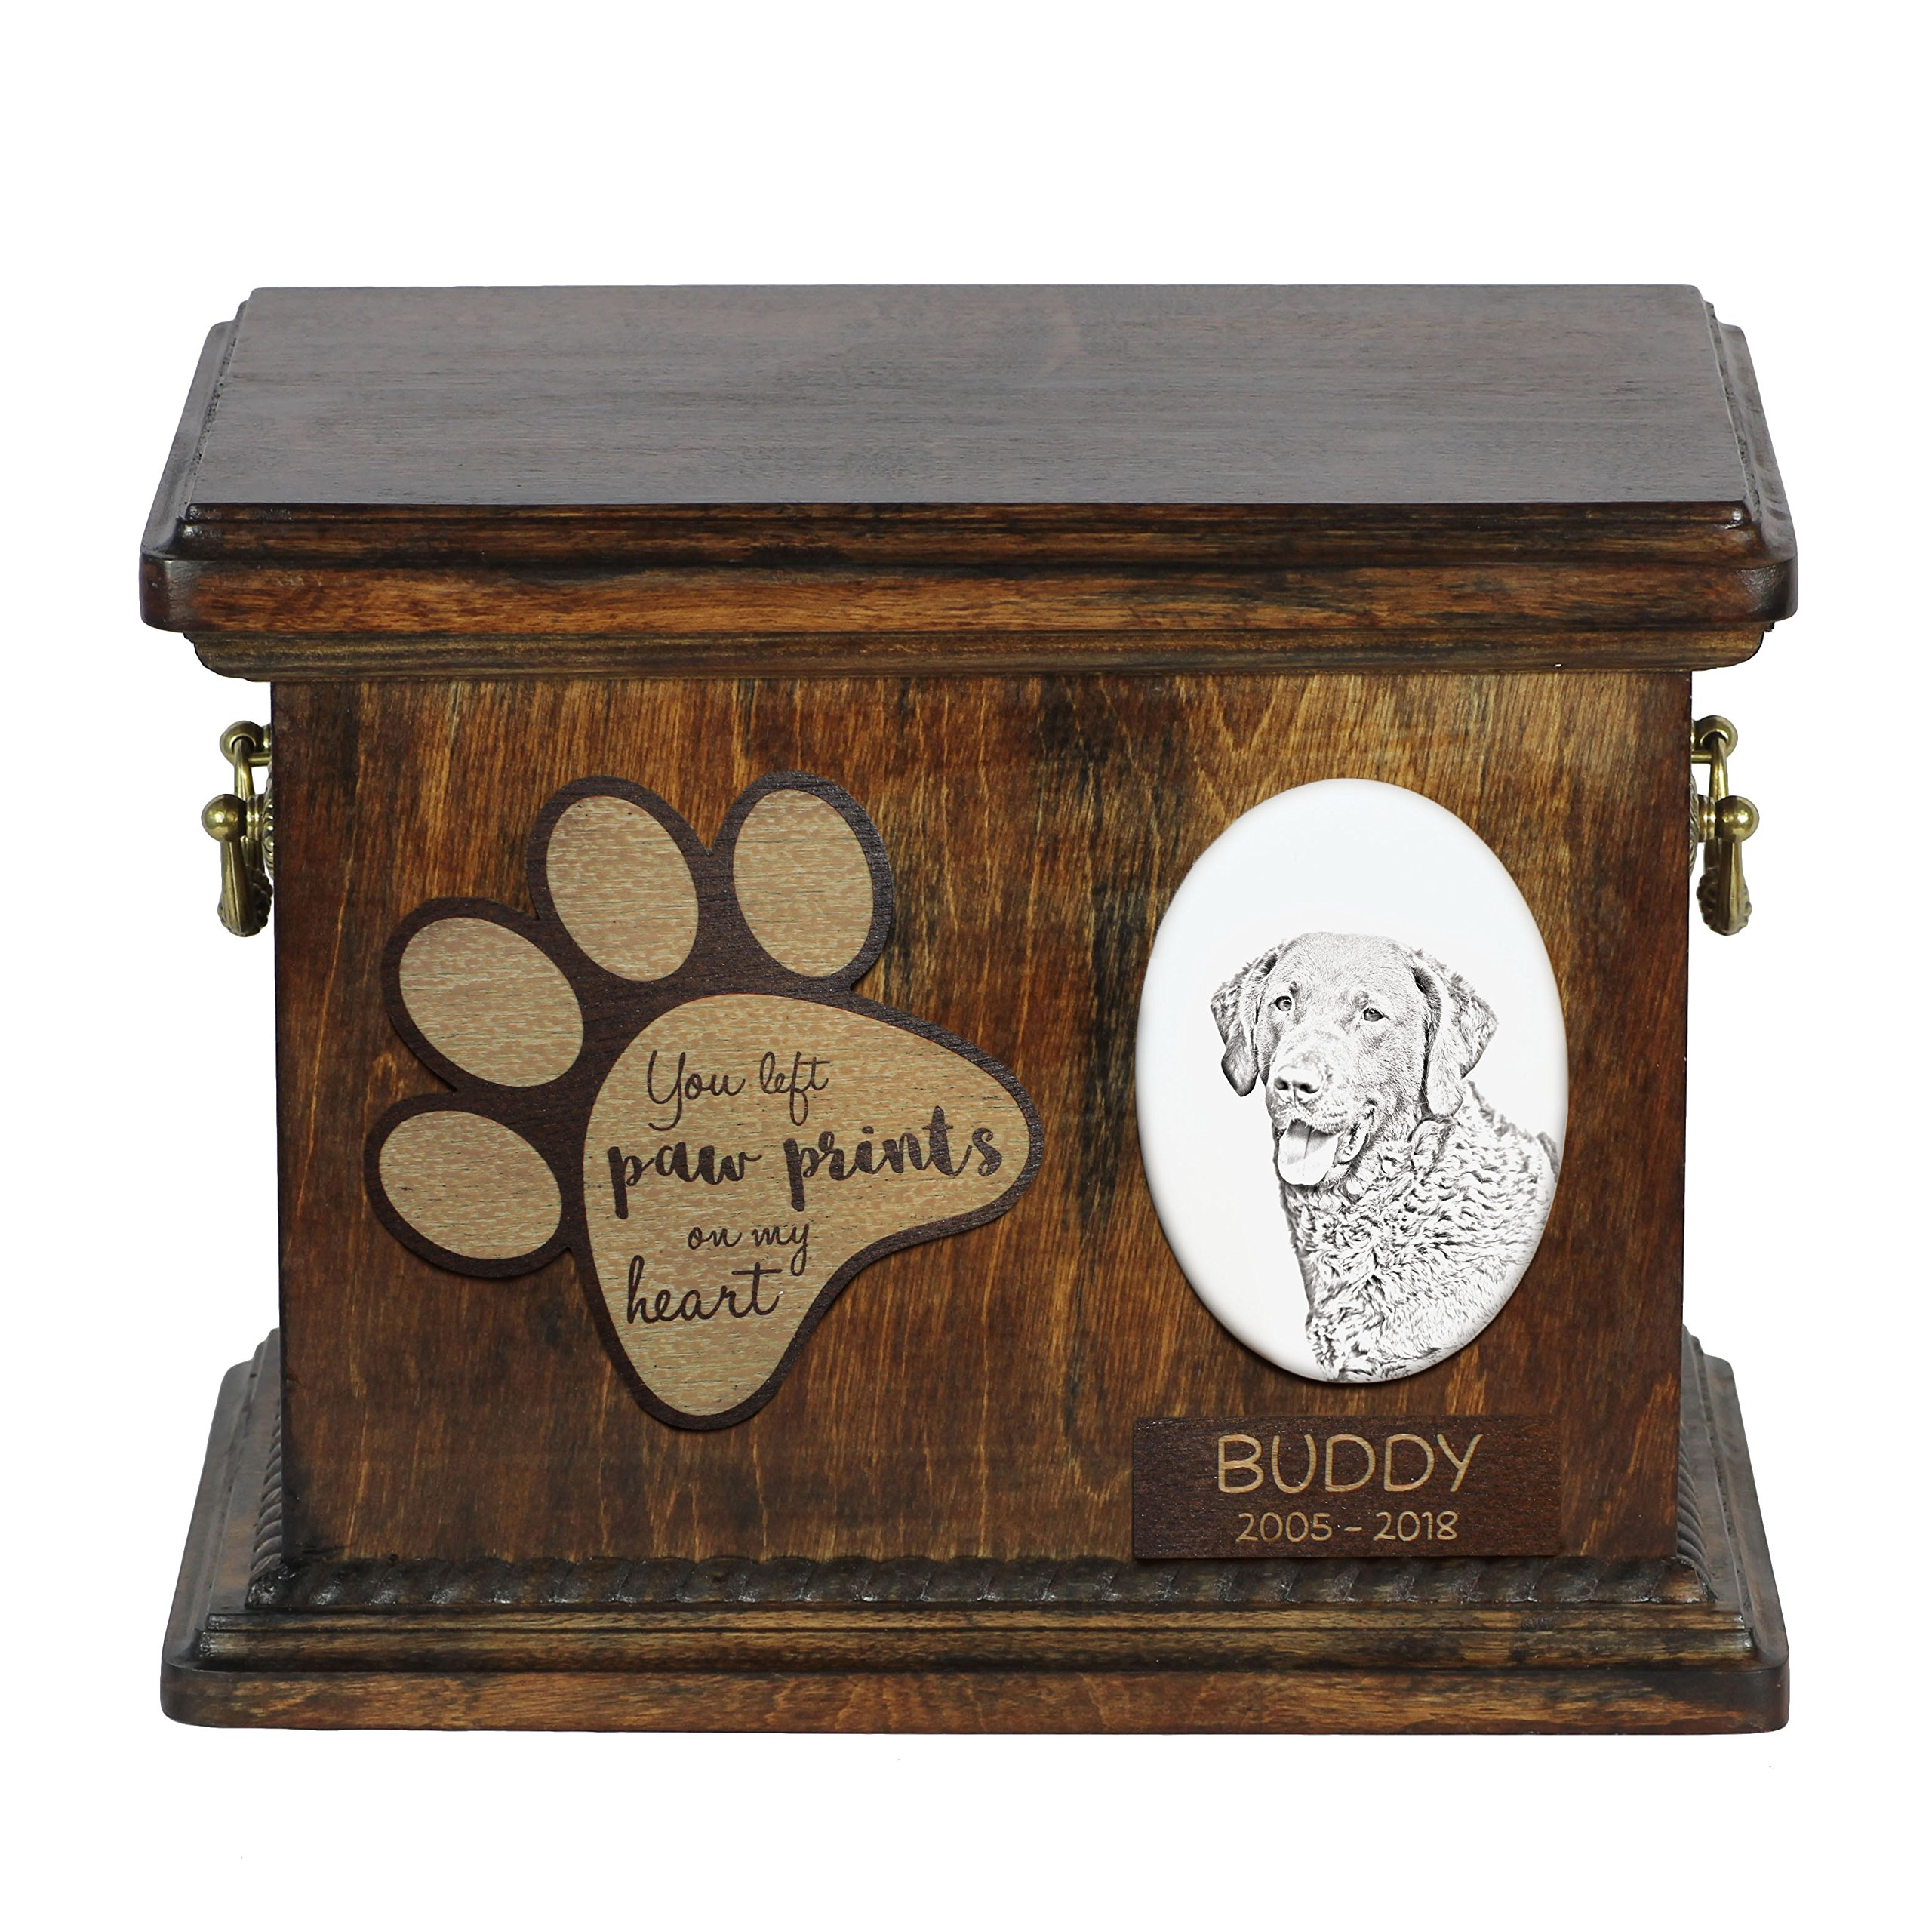 ArtDog Ltd. Chesapeake Bay Retriever, urn for dog's ashes with ceramic plate and description